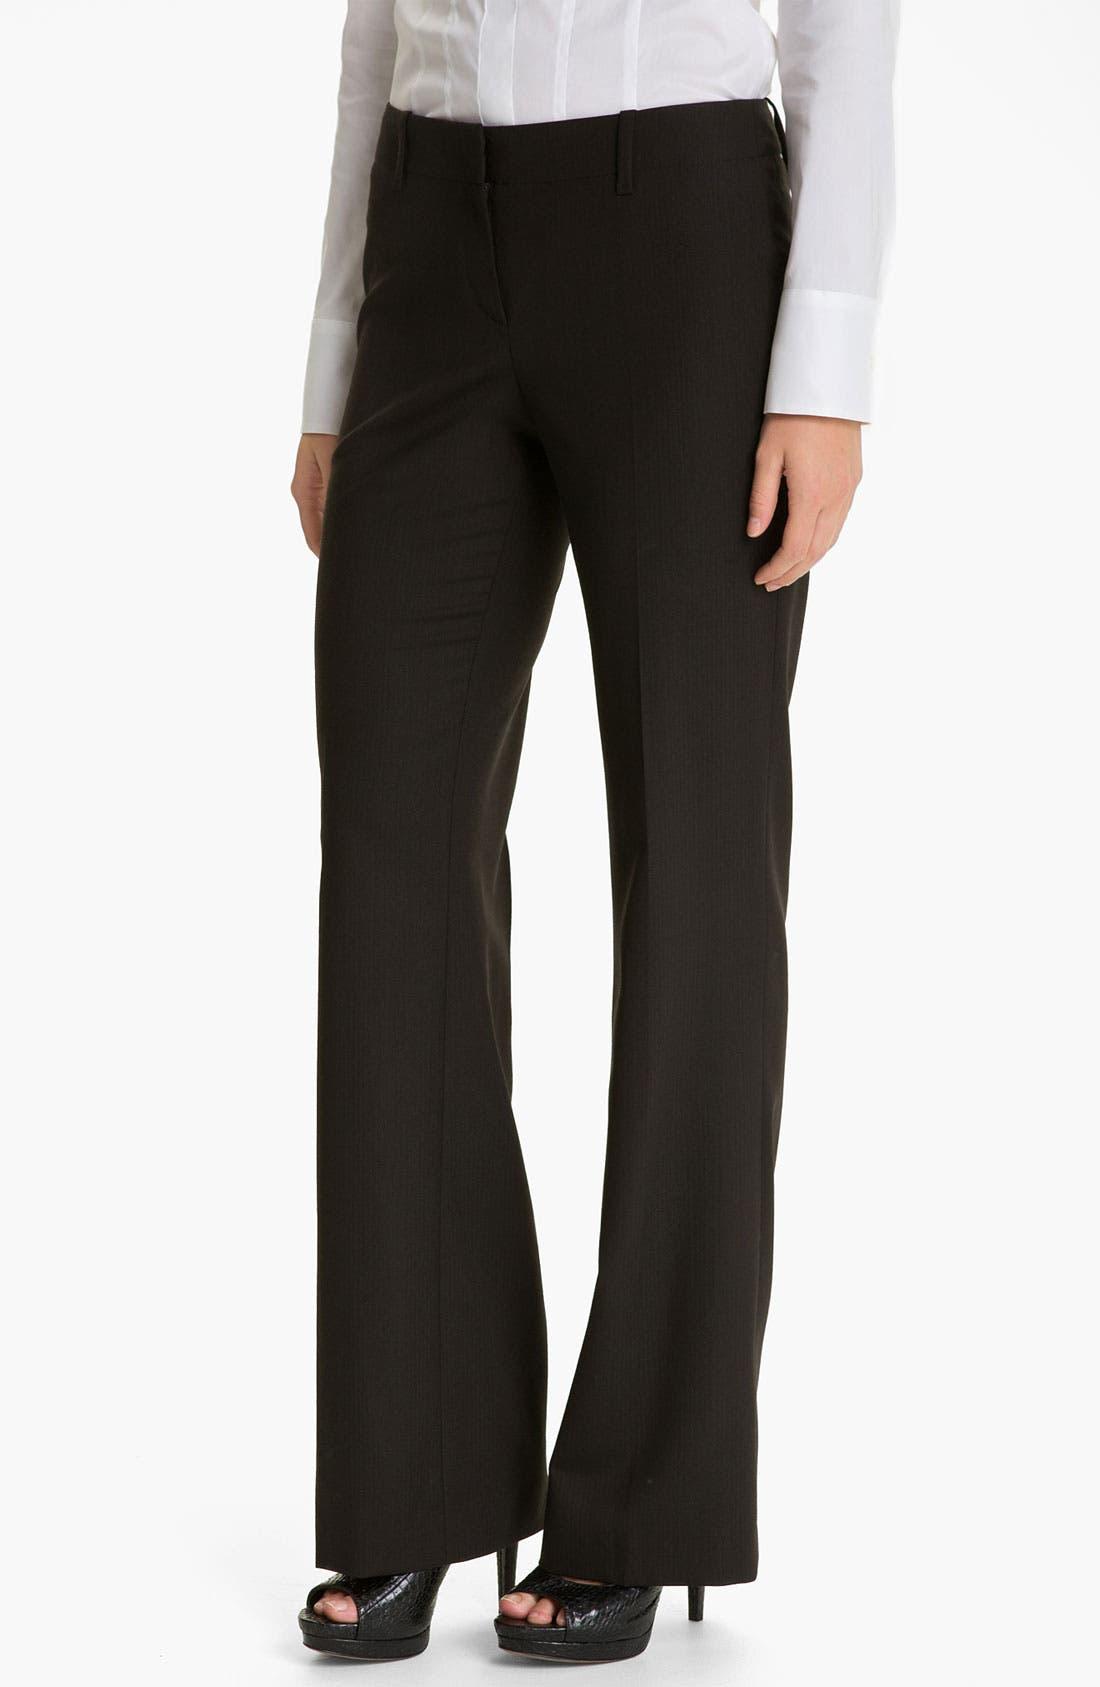 Alternate Image 1 Selected - BOSS Black 'Tulia' Pants